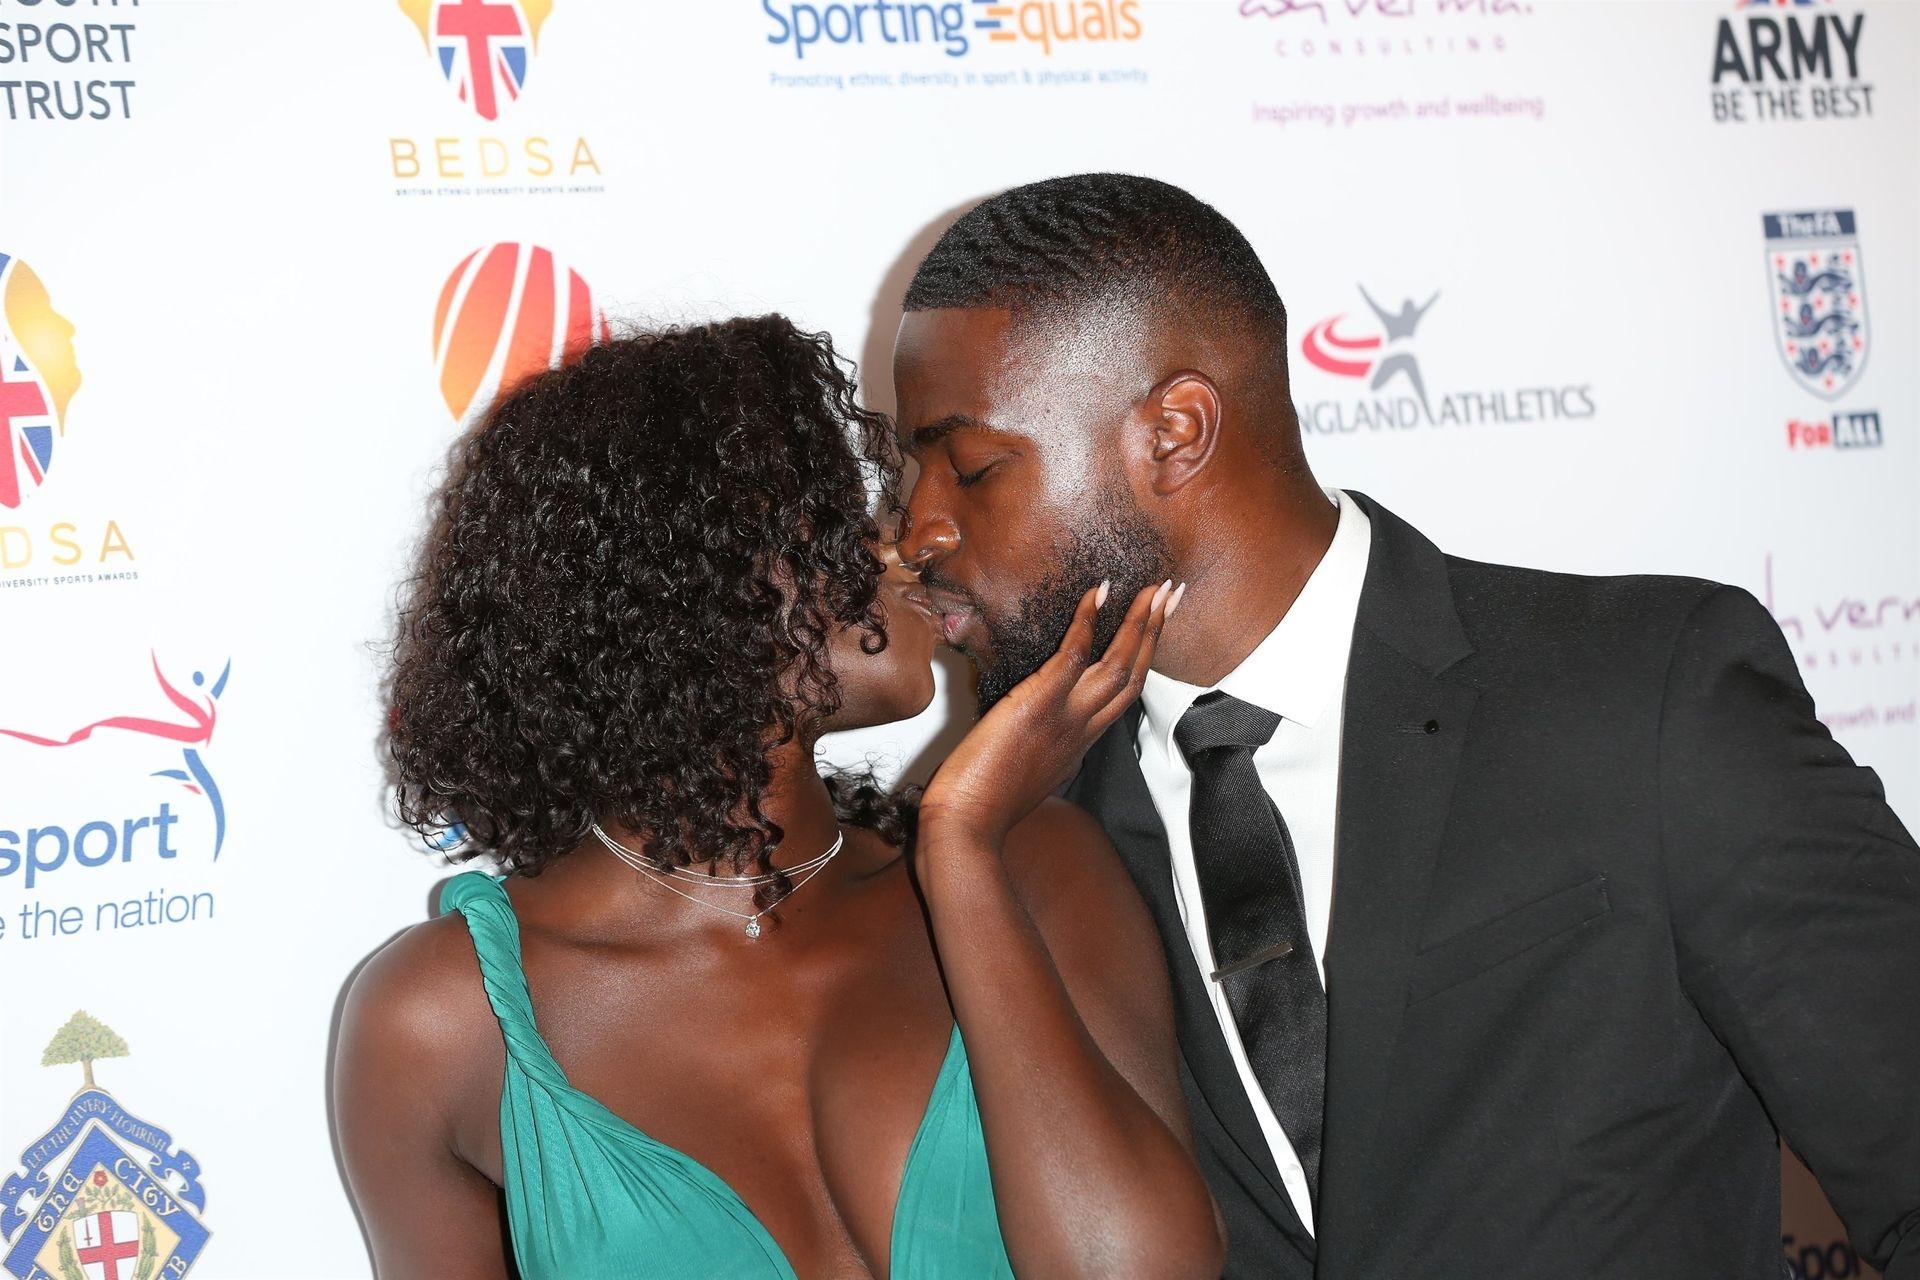 Mike Boateng & Priscilla Anyabu Are Seen At British Ethnic Diversity Sports Awards 0069